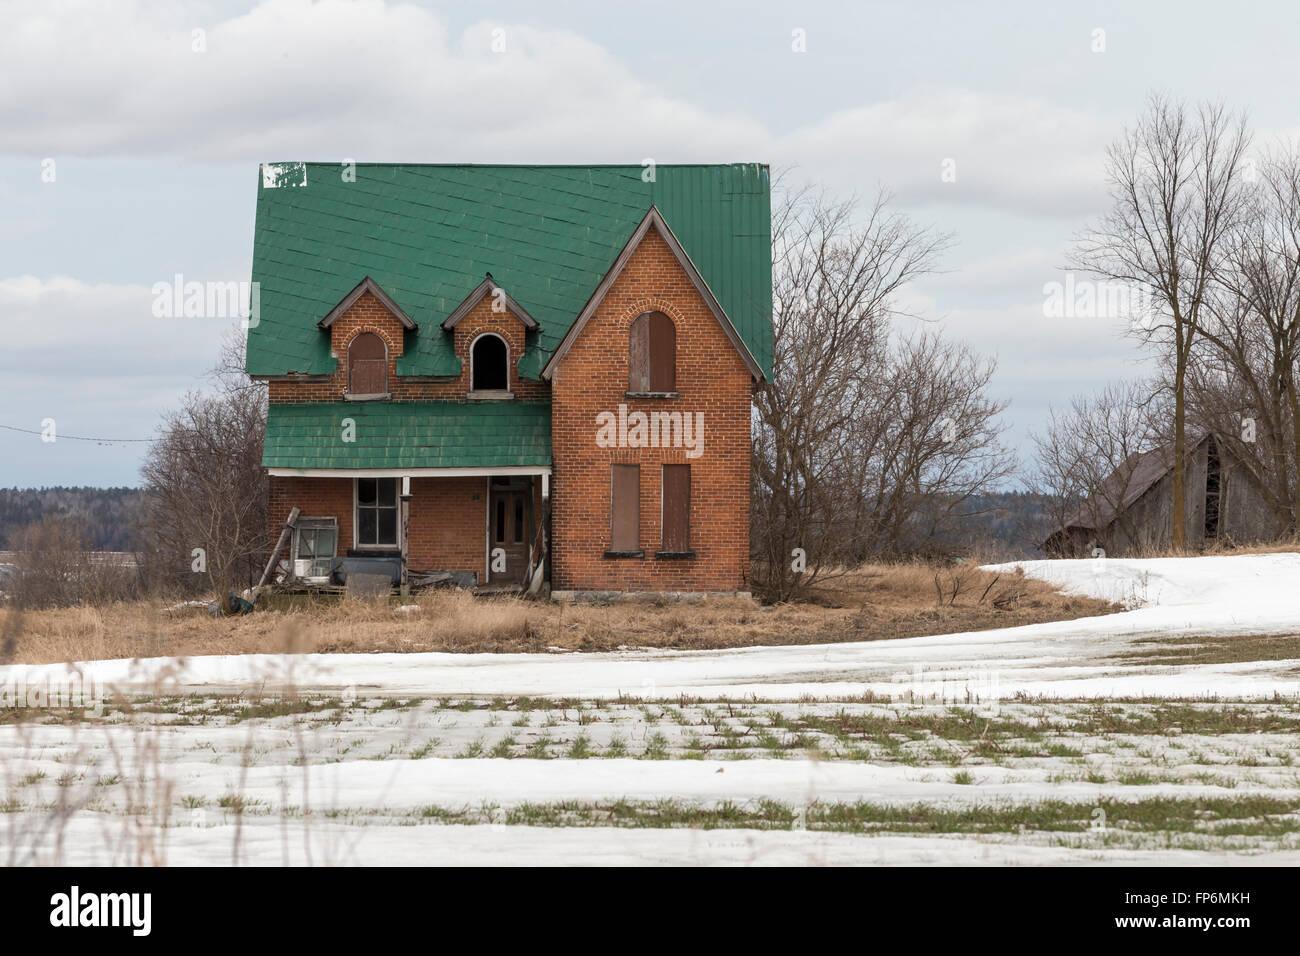 Decrepit building in a farmers field - Stock Image